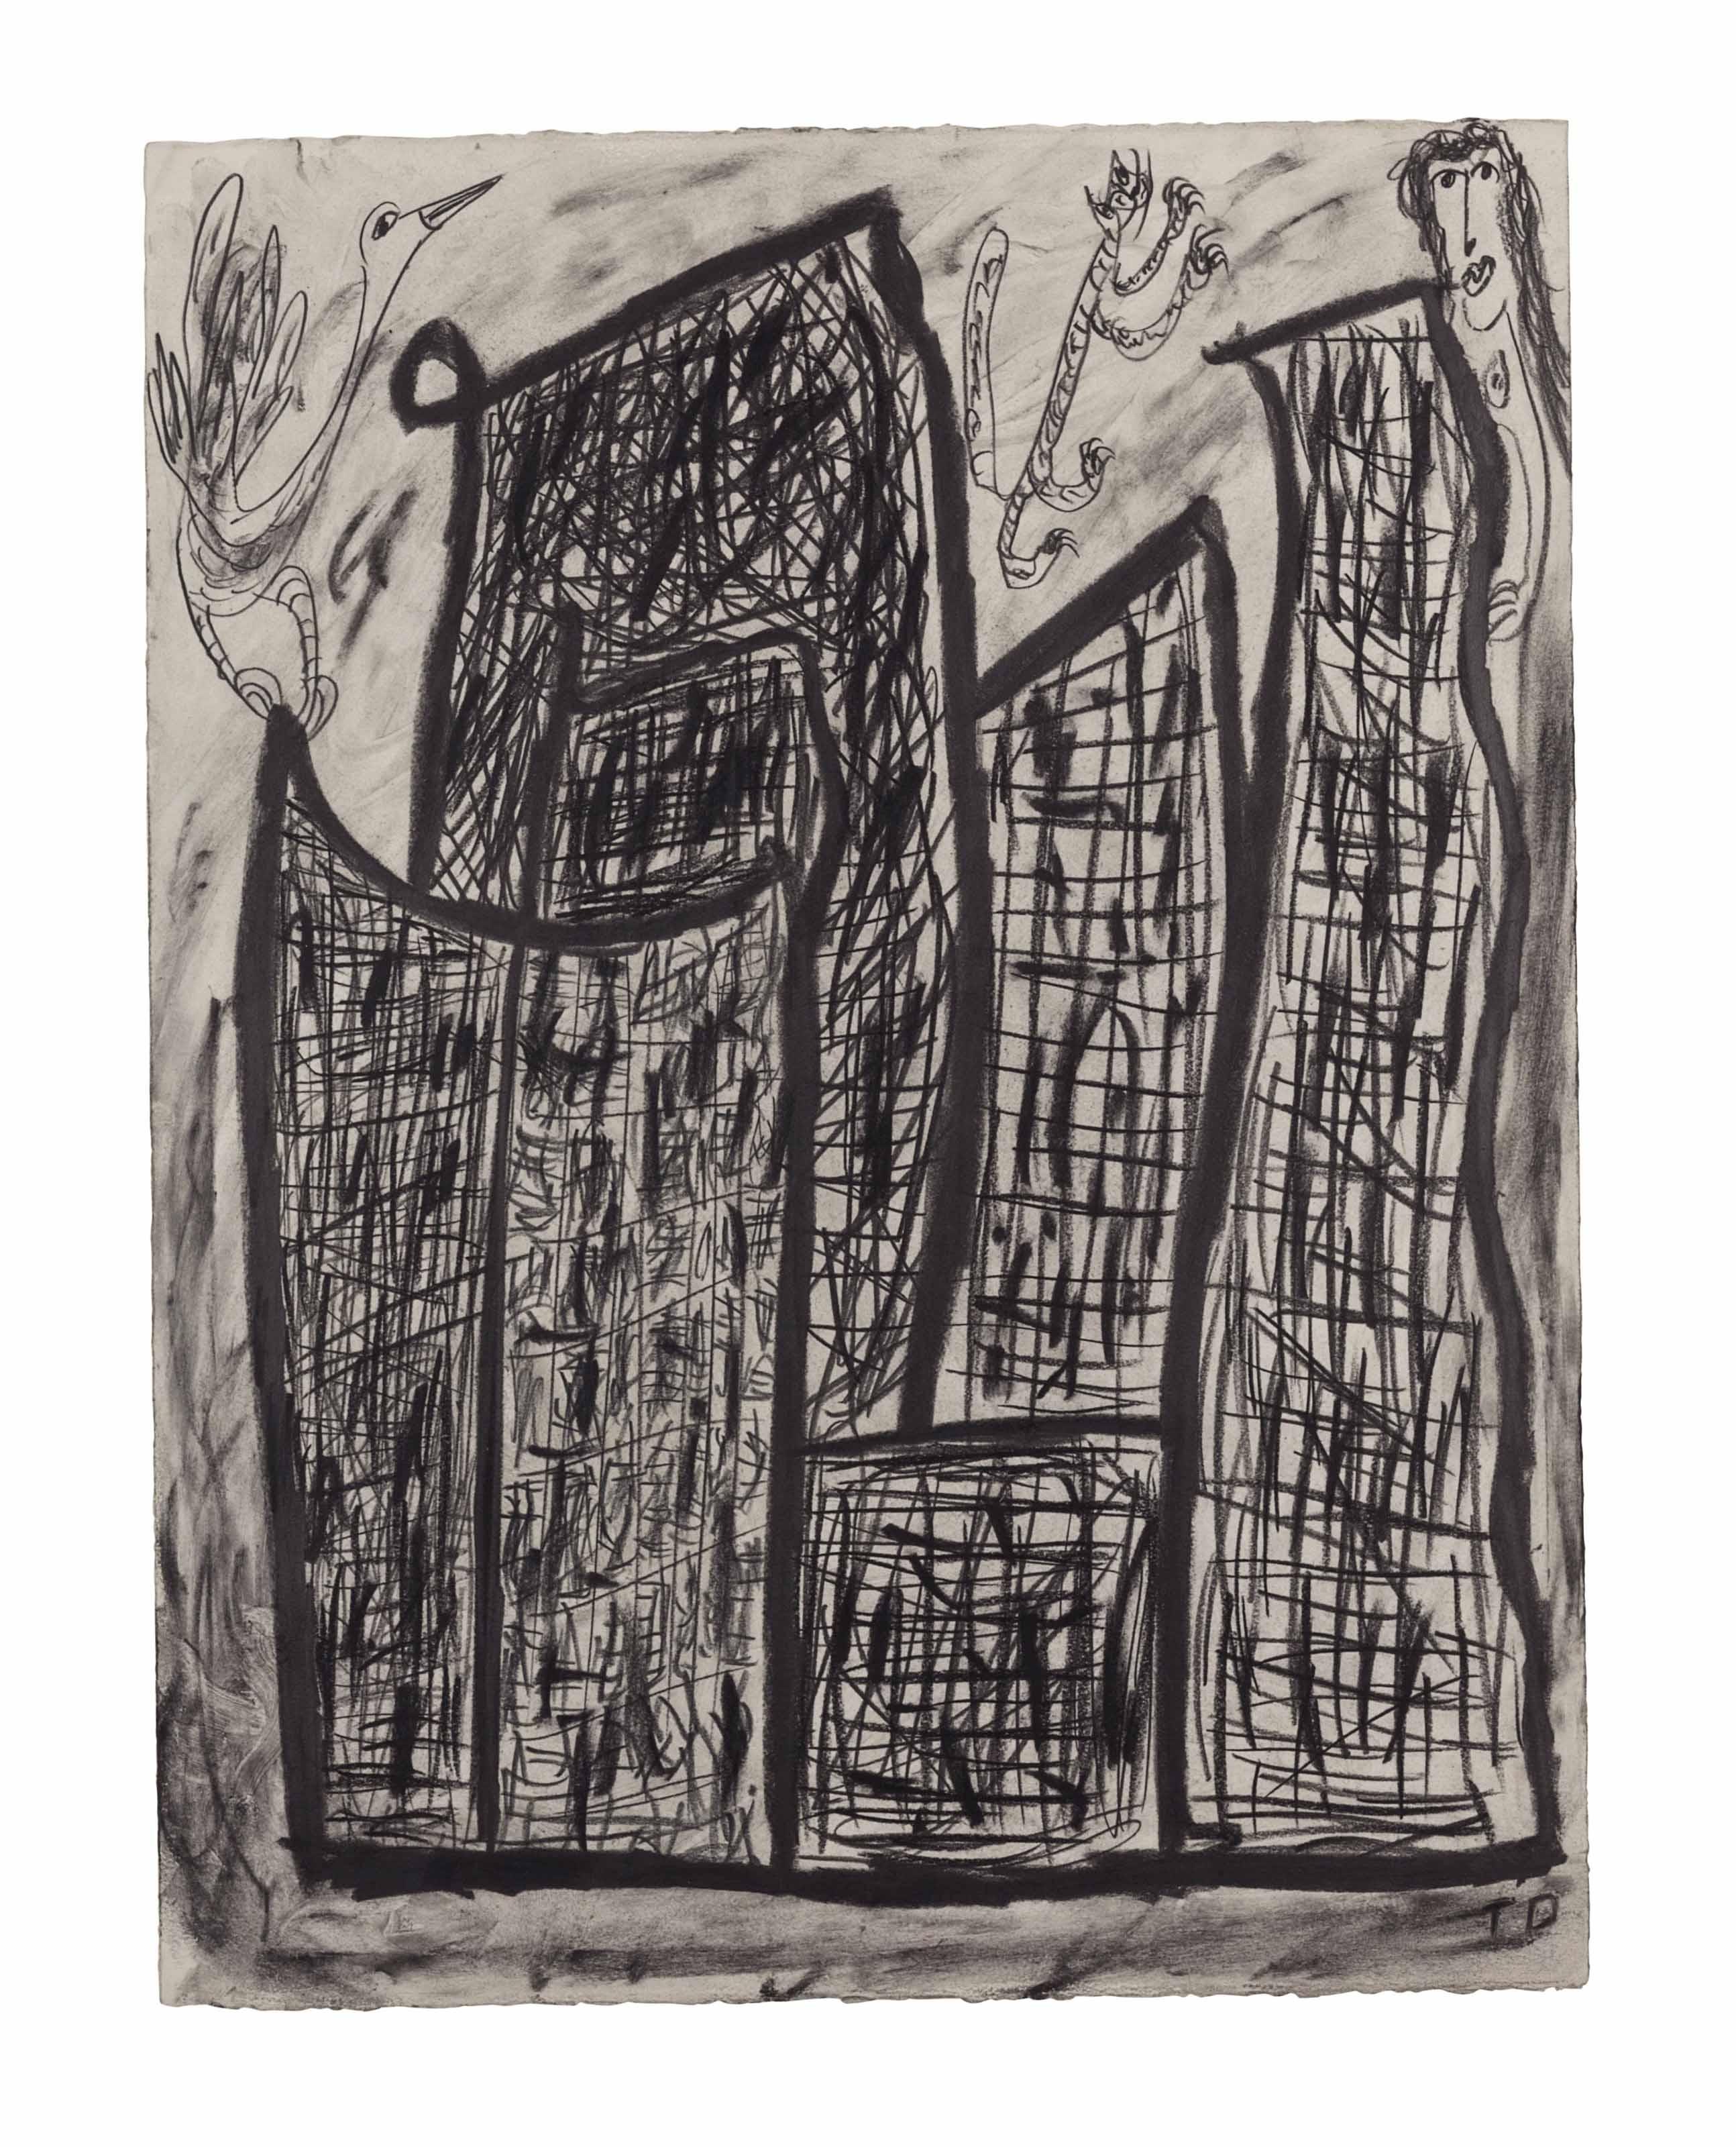 Thornton Dial (1928-2016)